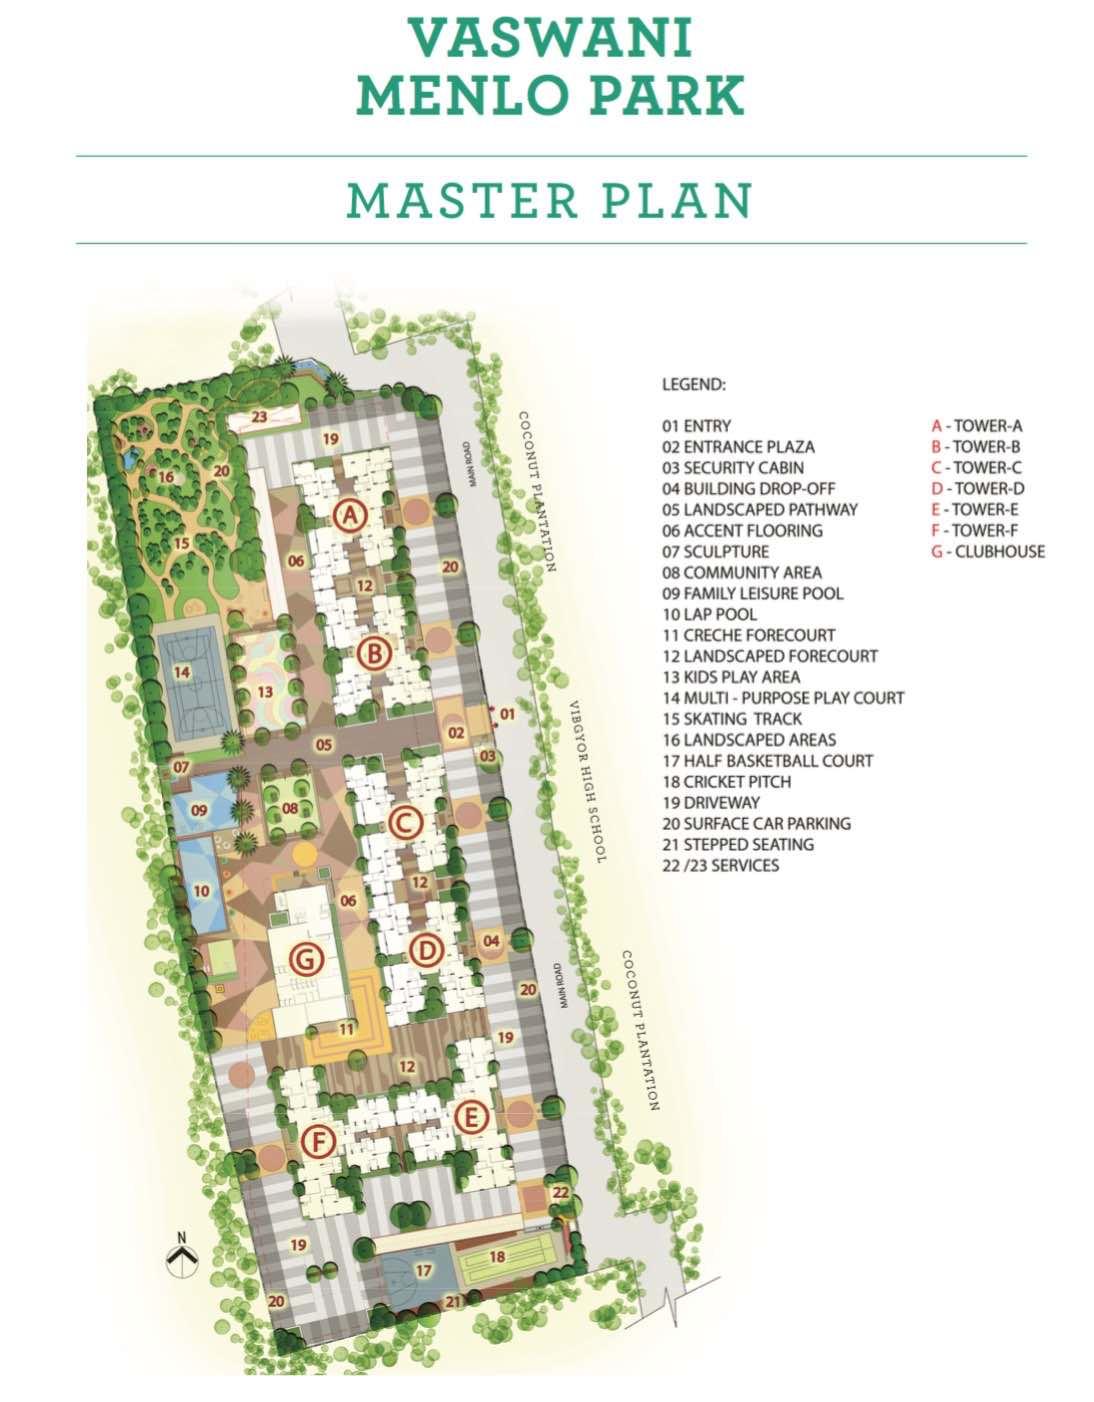 Vaswani Menlo Park Master Plan